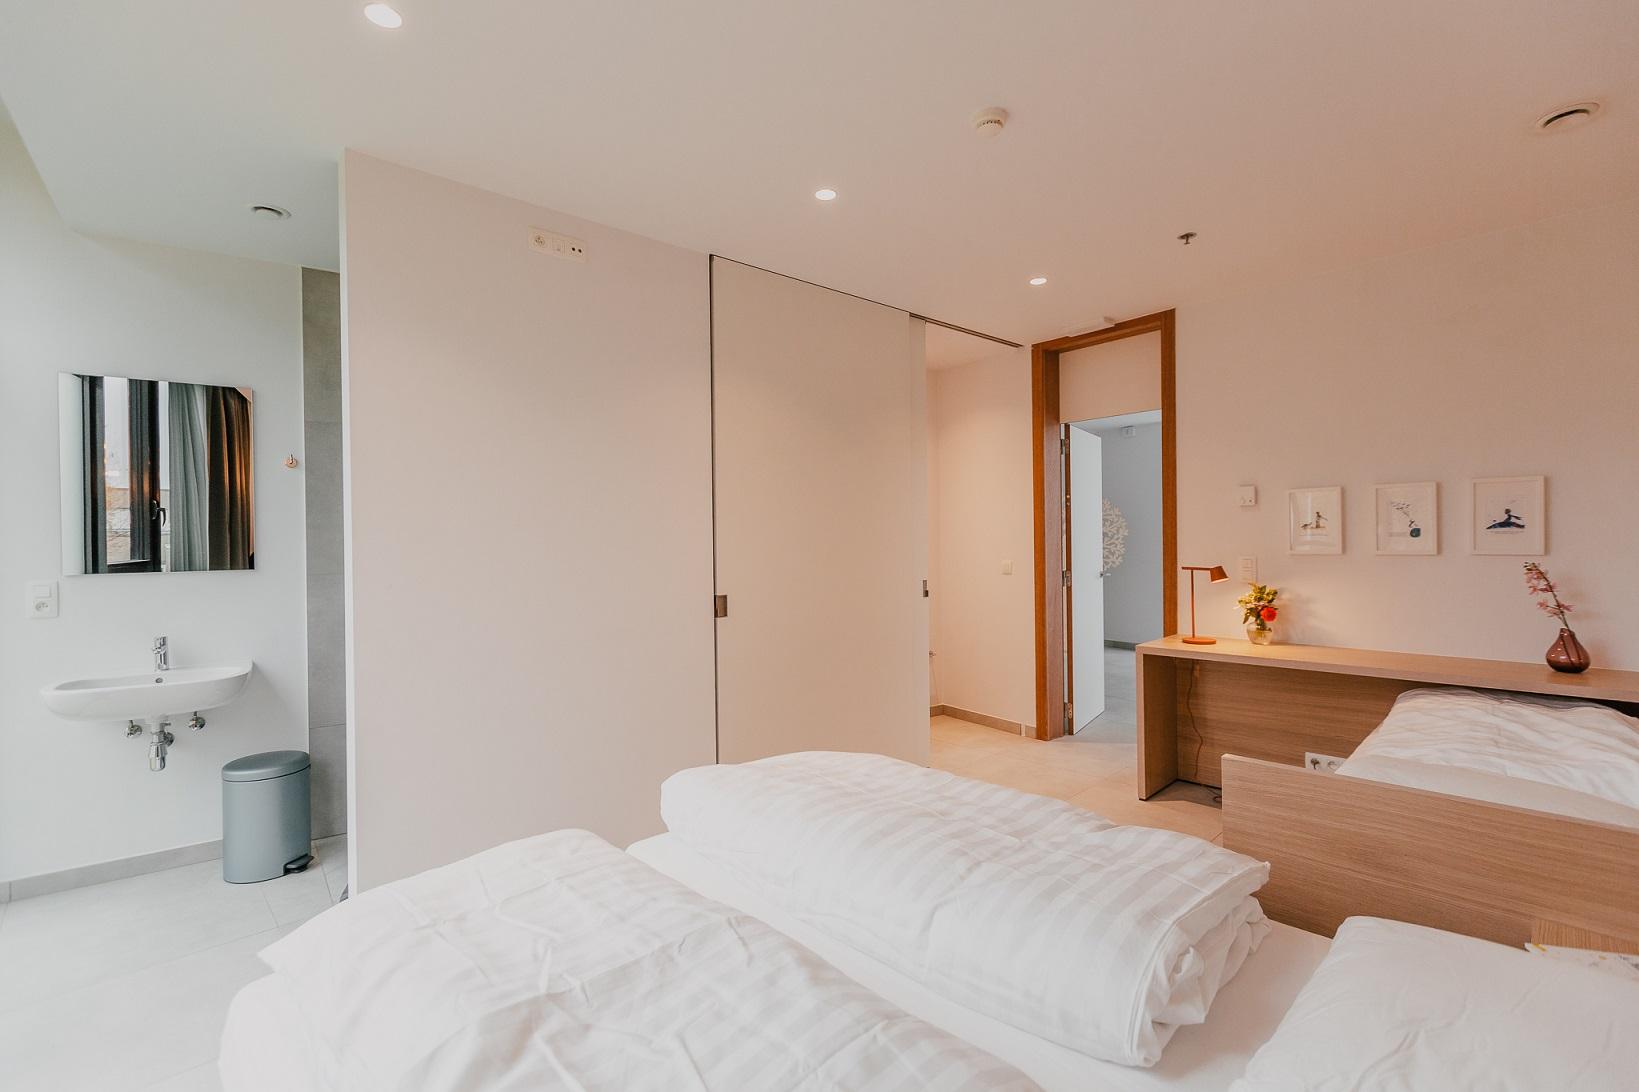 RonaldMcDonald-slaapkamer1.jpg